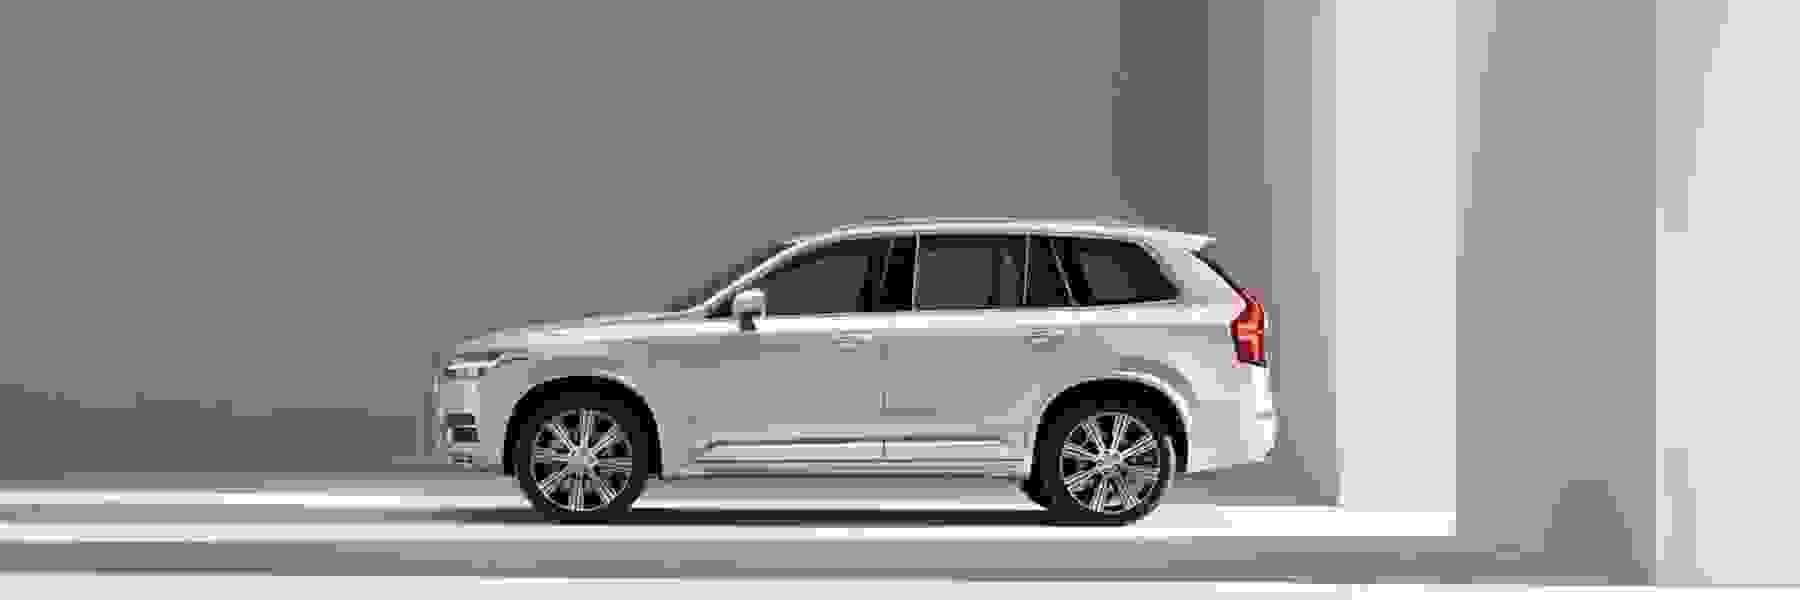 Volvo XC90 | Latest & Greatest?